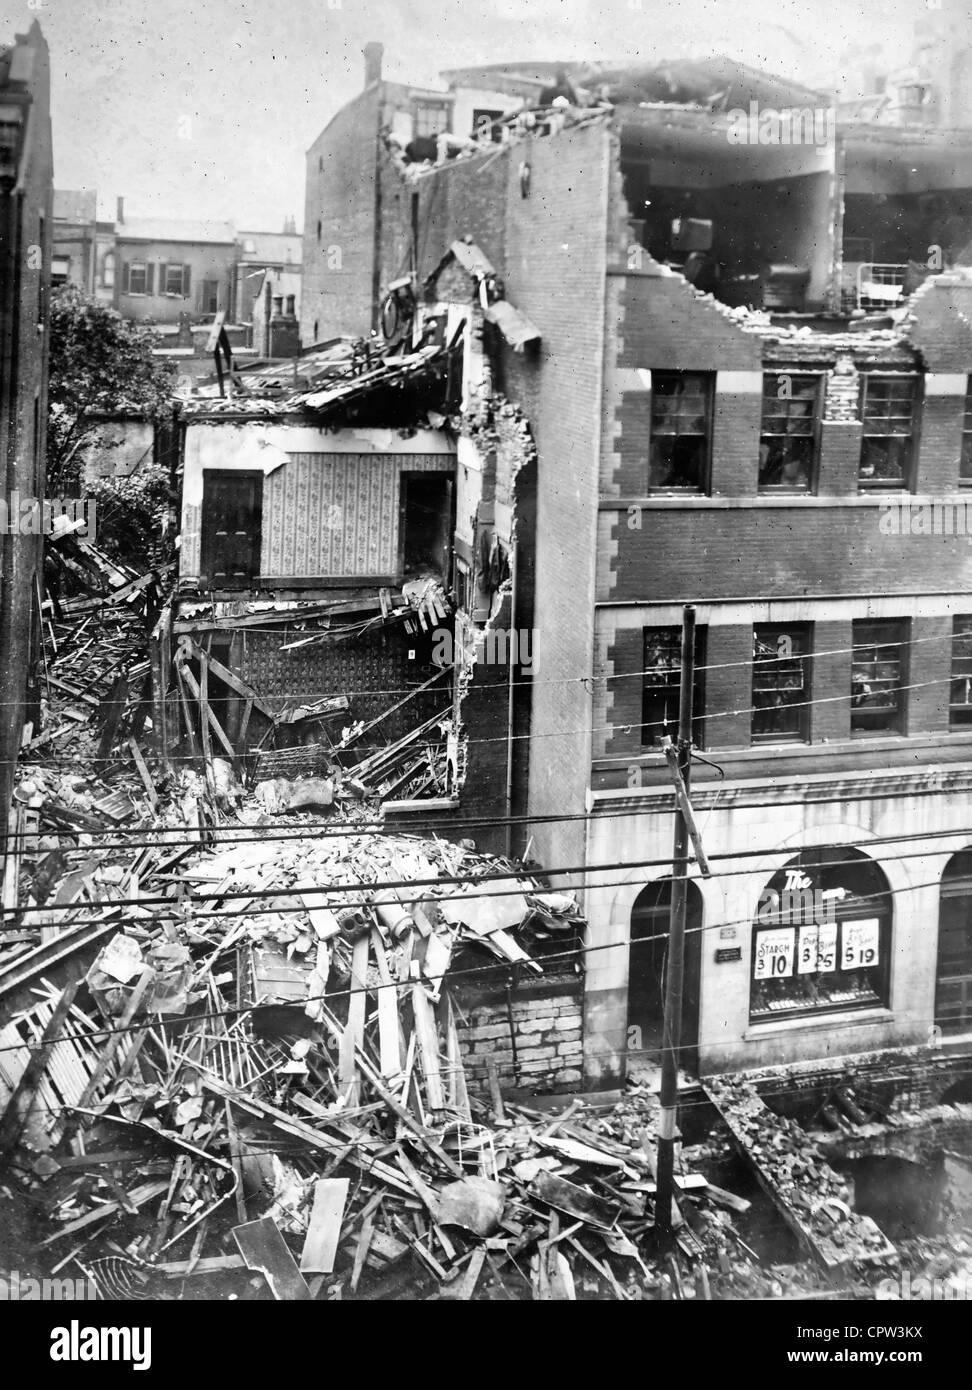 Cincinnati Tornado aftermath - July 1915 - Stock Image